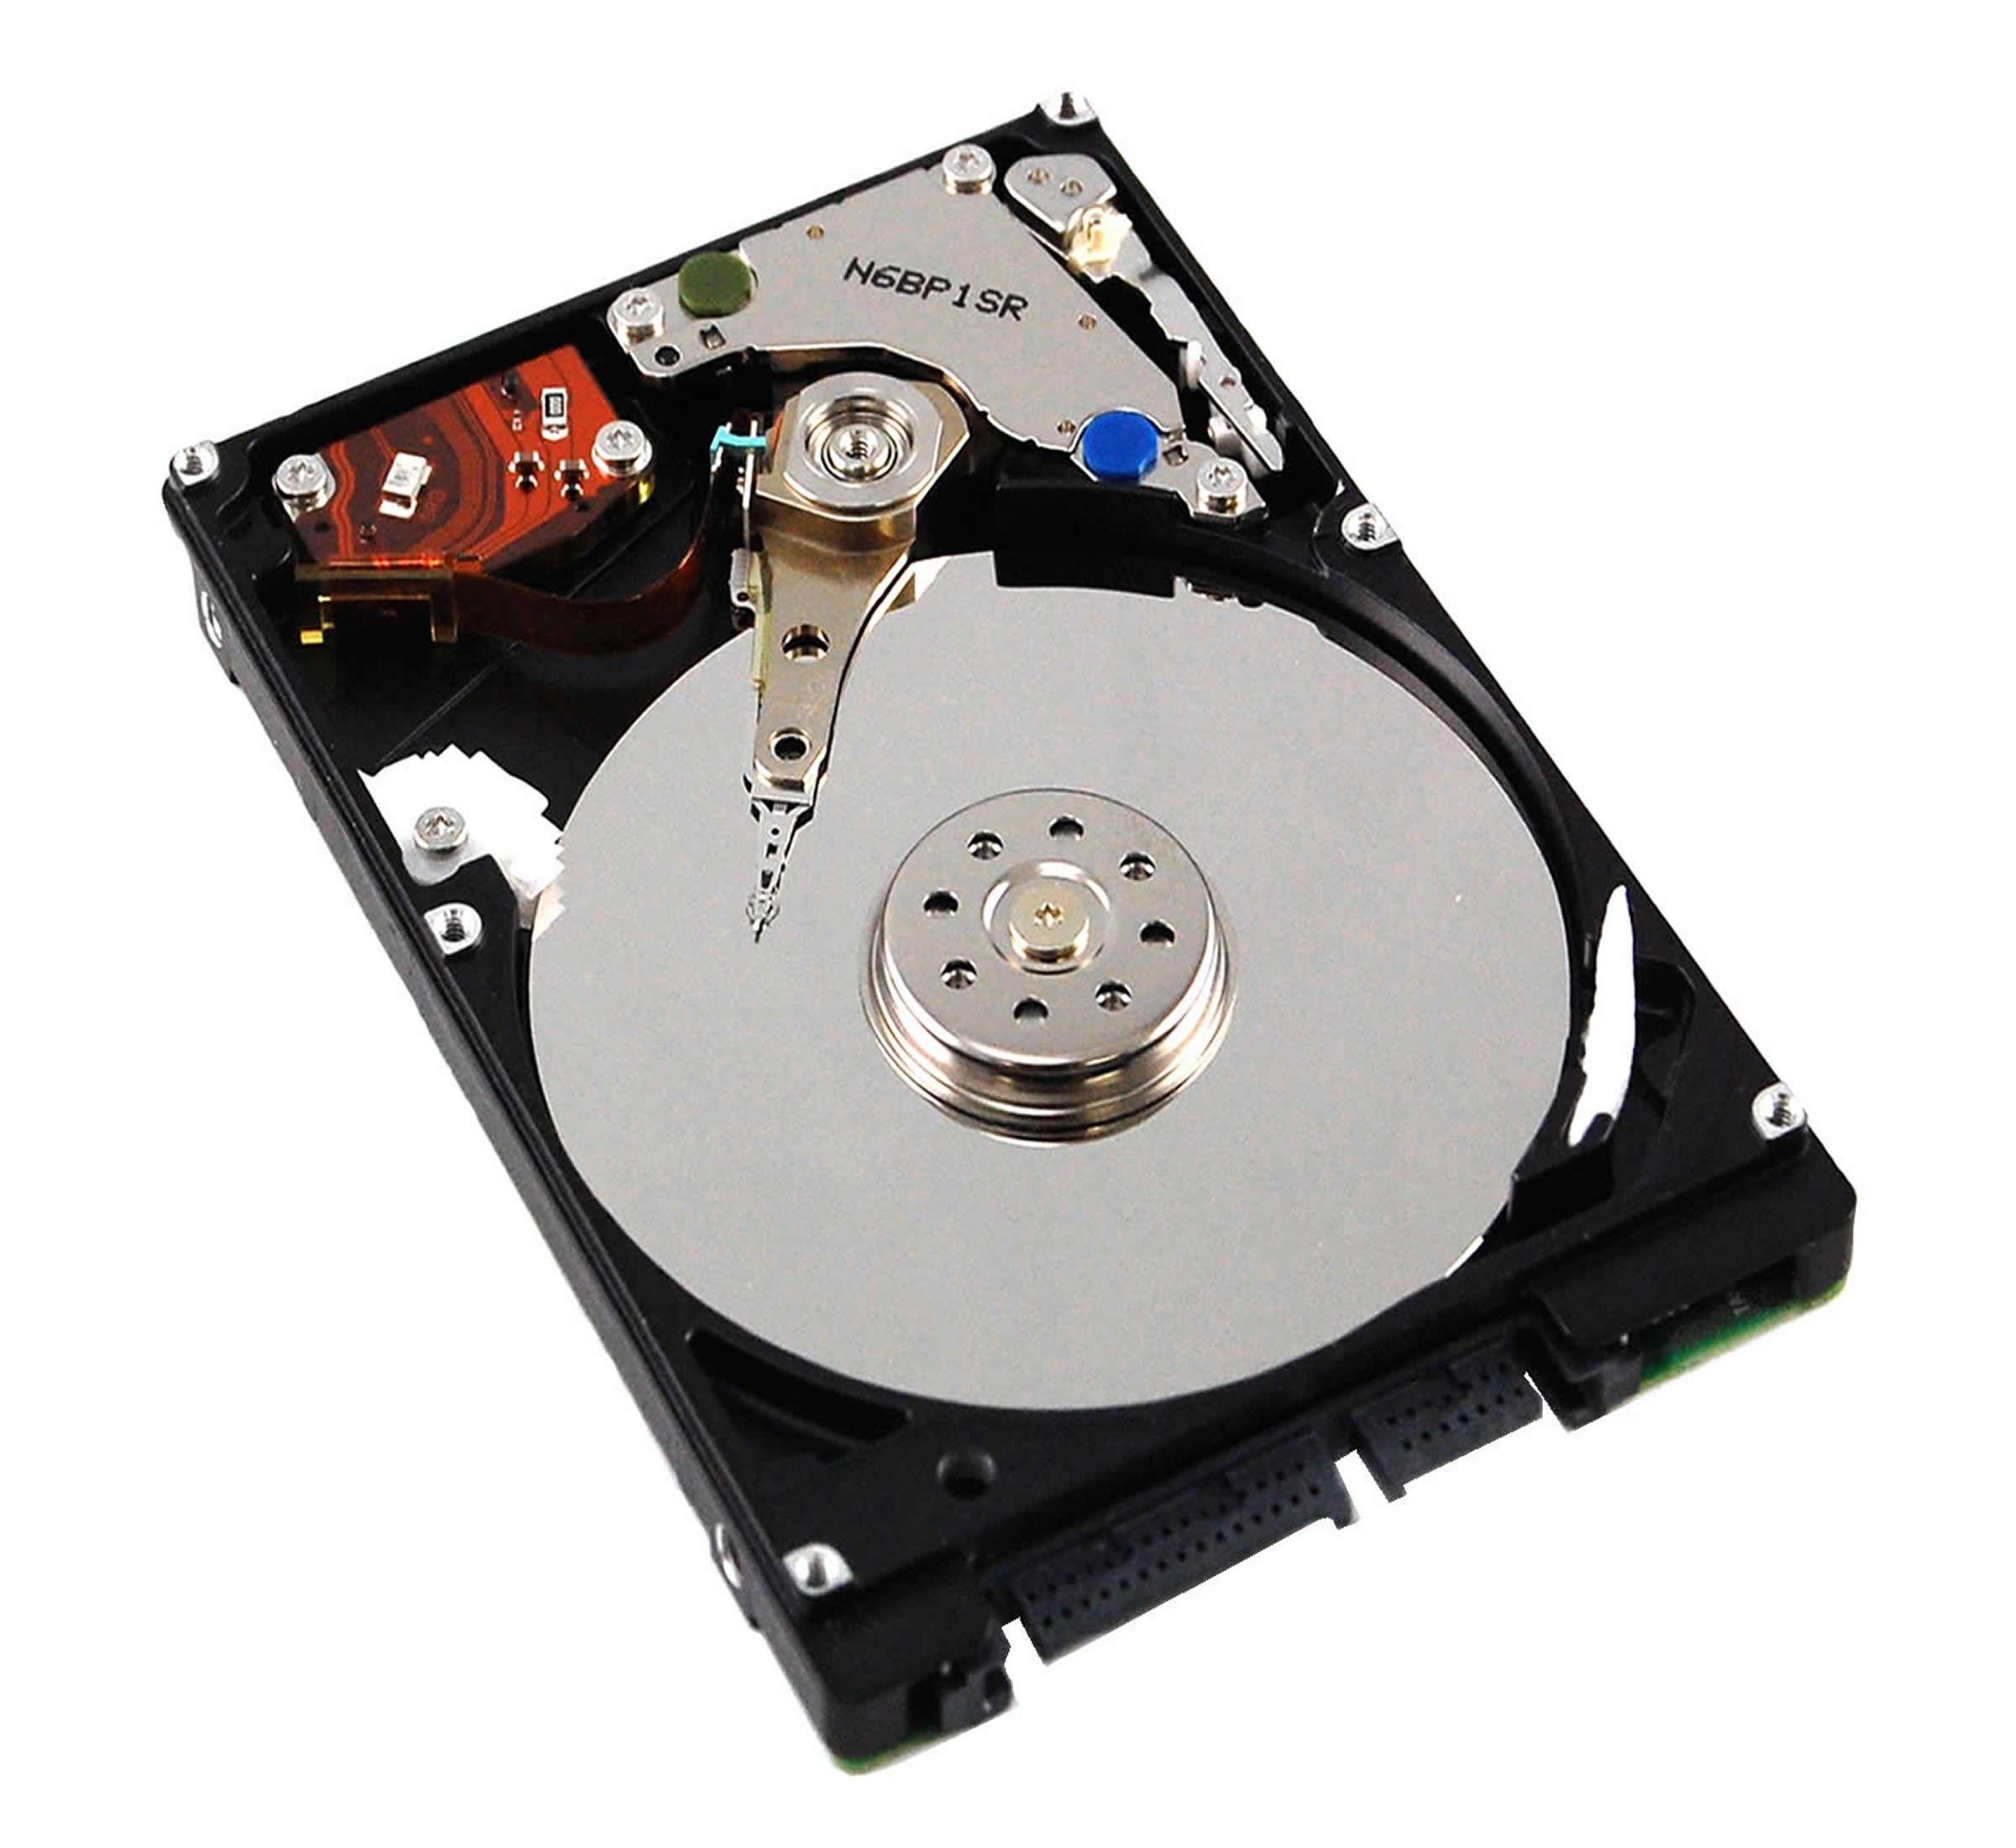 Seagate St95005620as Sata 500gb Hdd Hard Disk Drive 25 5400rpm Hardisk Internal Pc Laptop